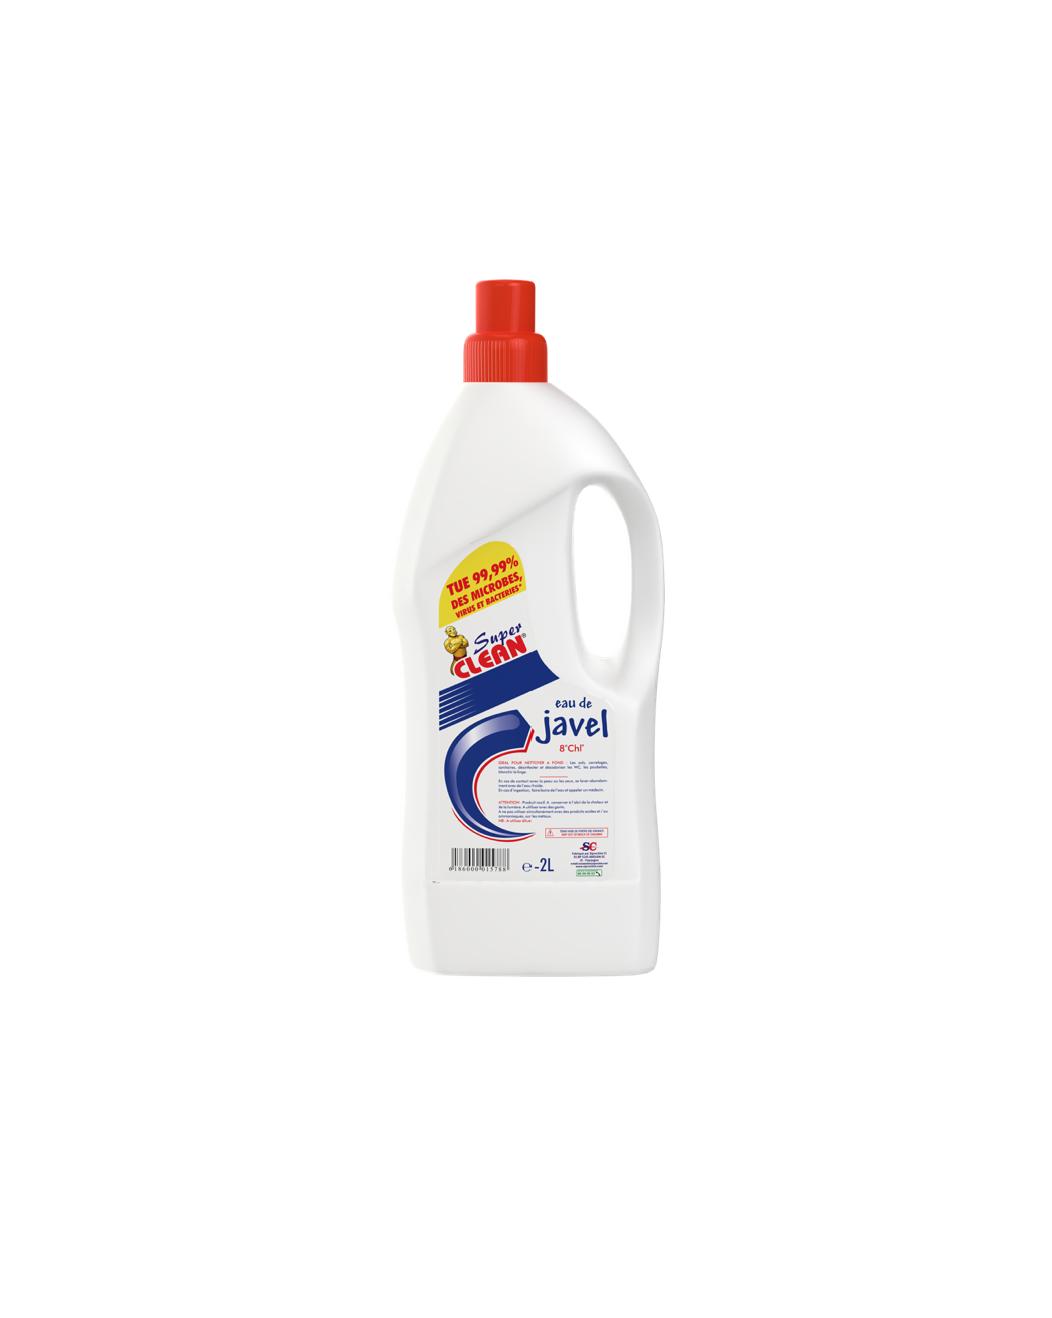 SUPER CLEAN_Eau de Javel 8° 2L